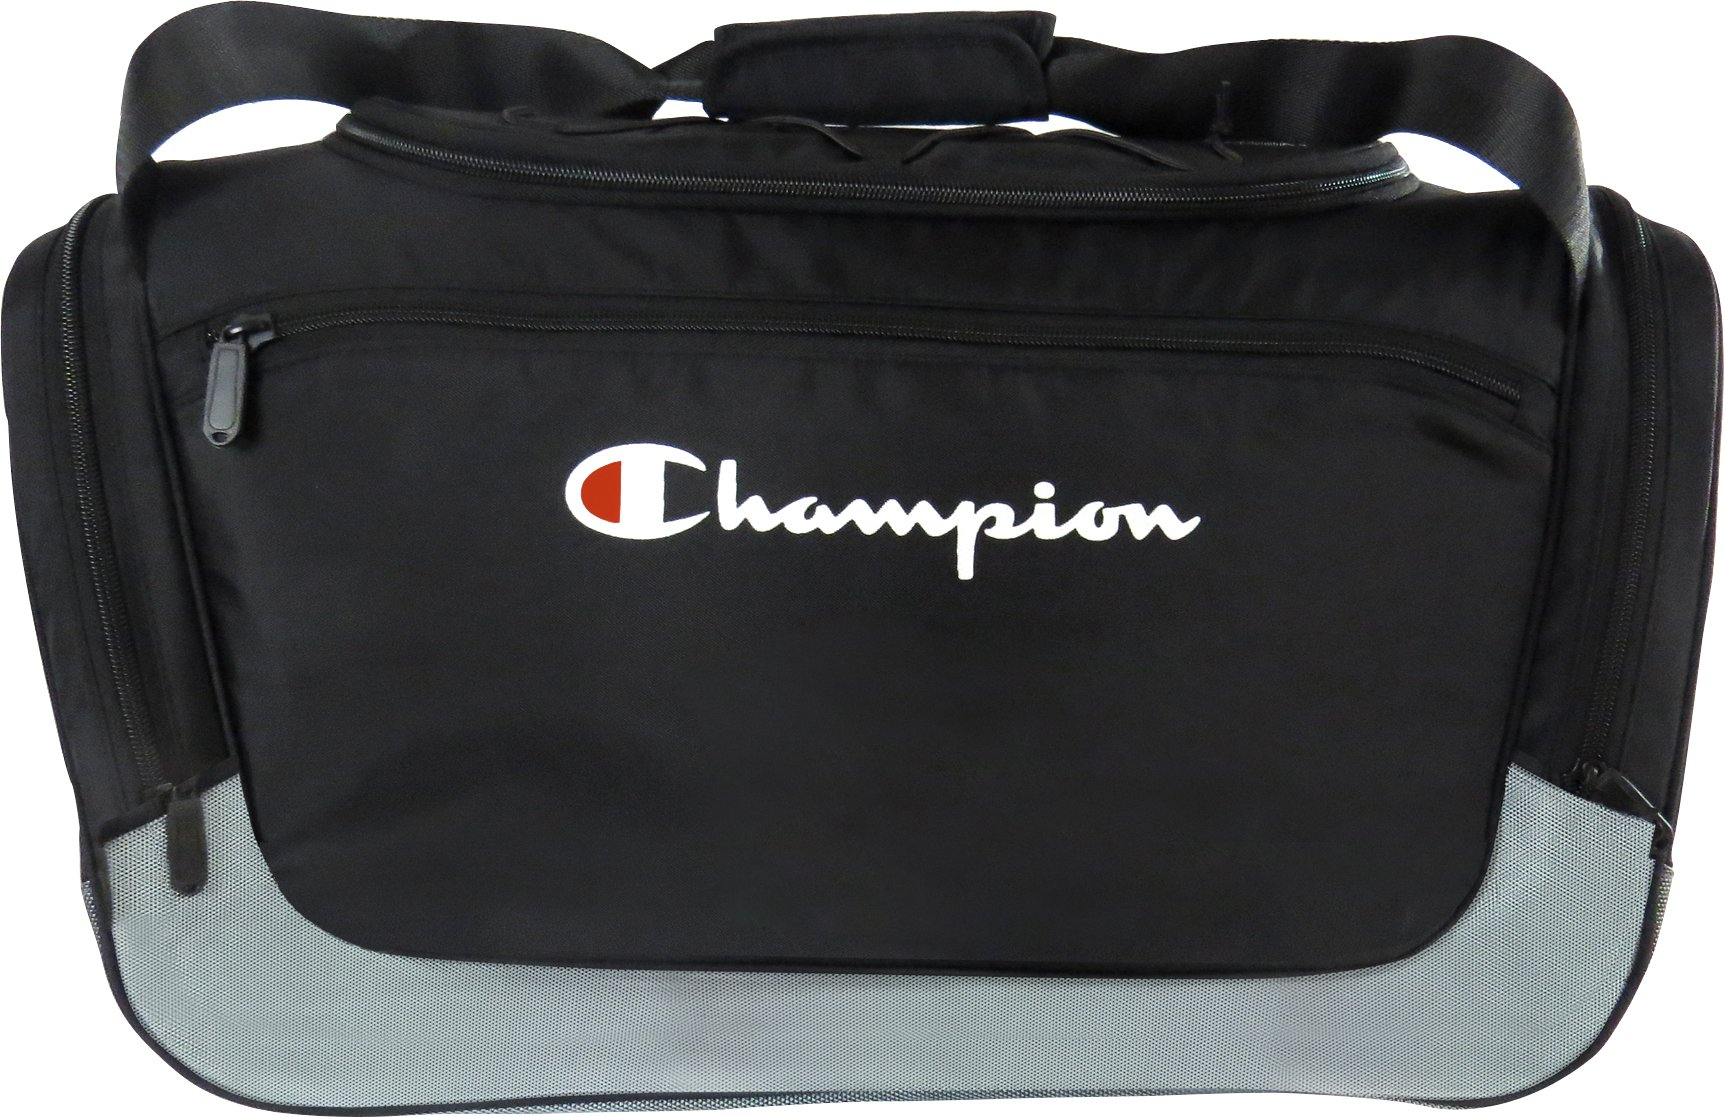 Champion Boost Medium Duffle, Black/Granite